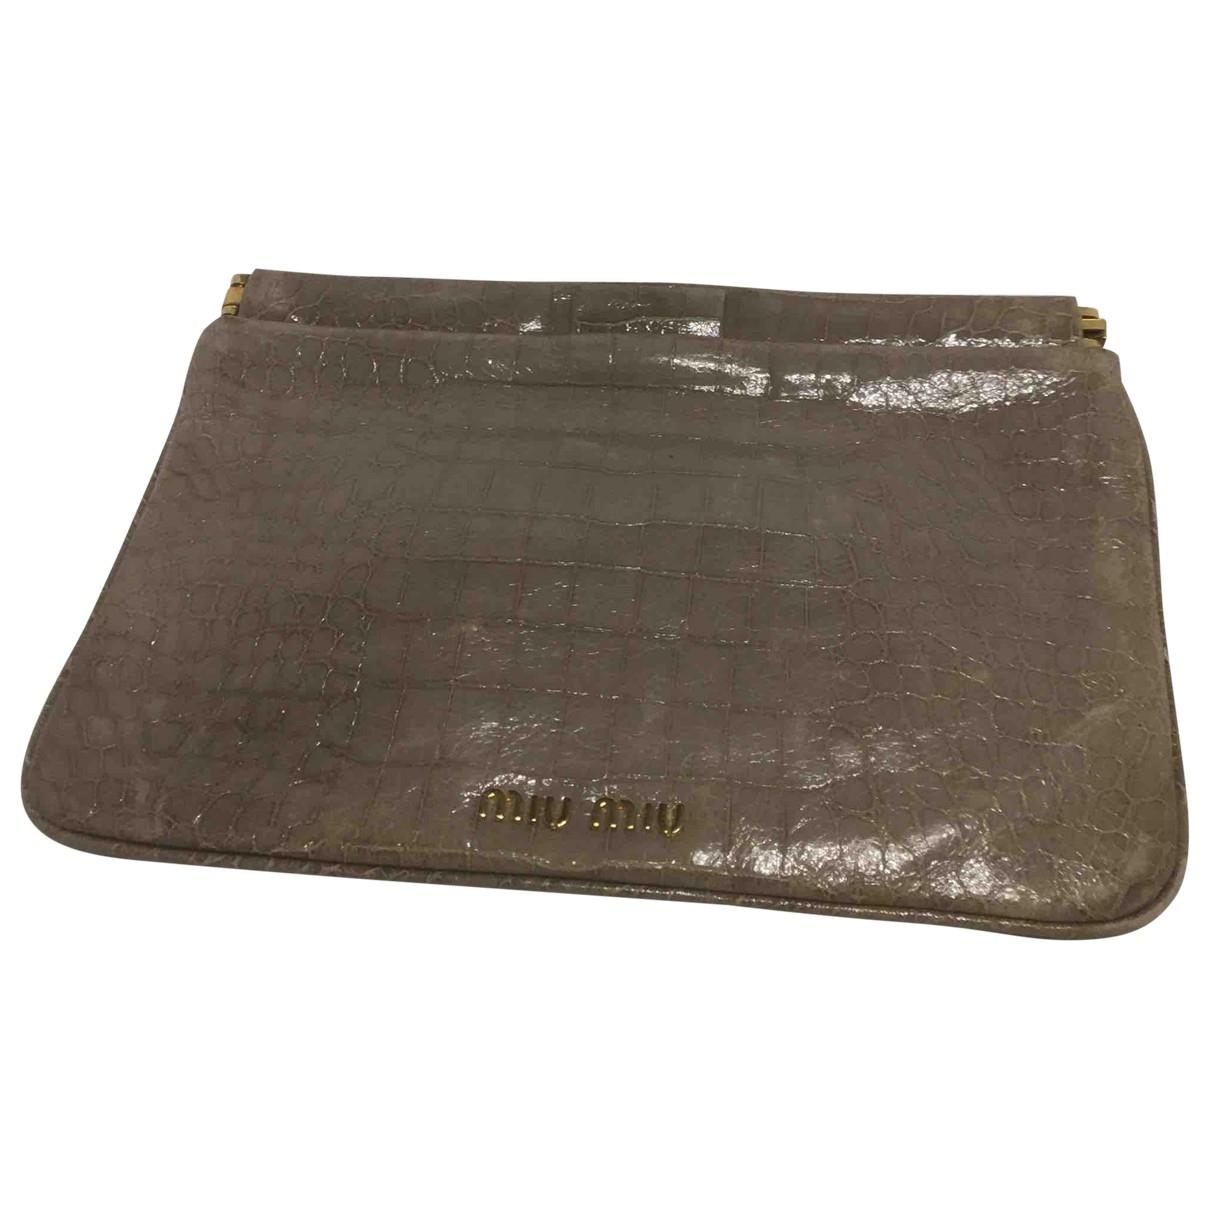 Miu Miu \N Grey Patent leather Clutch bag for Women \N